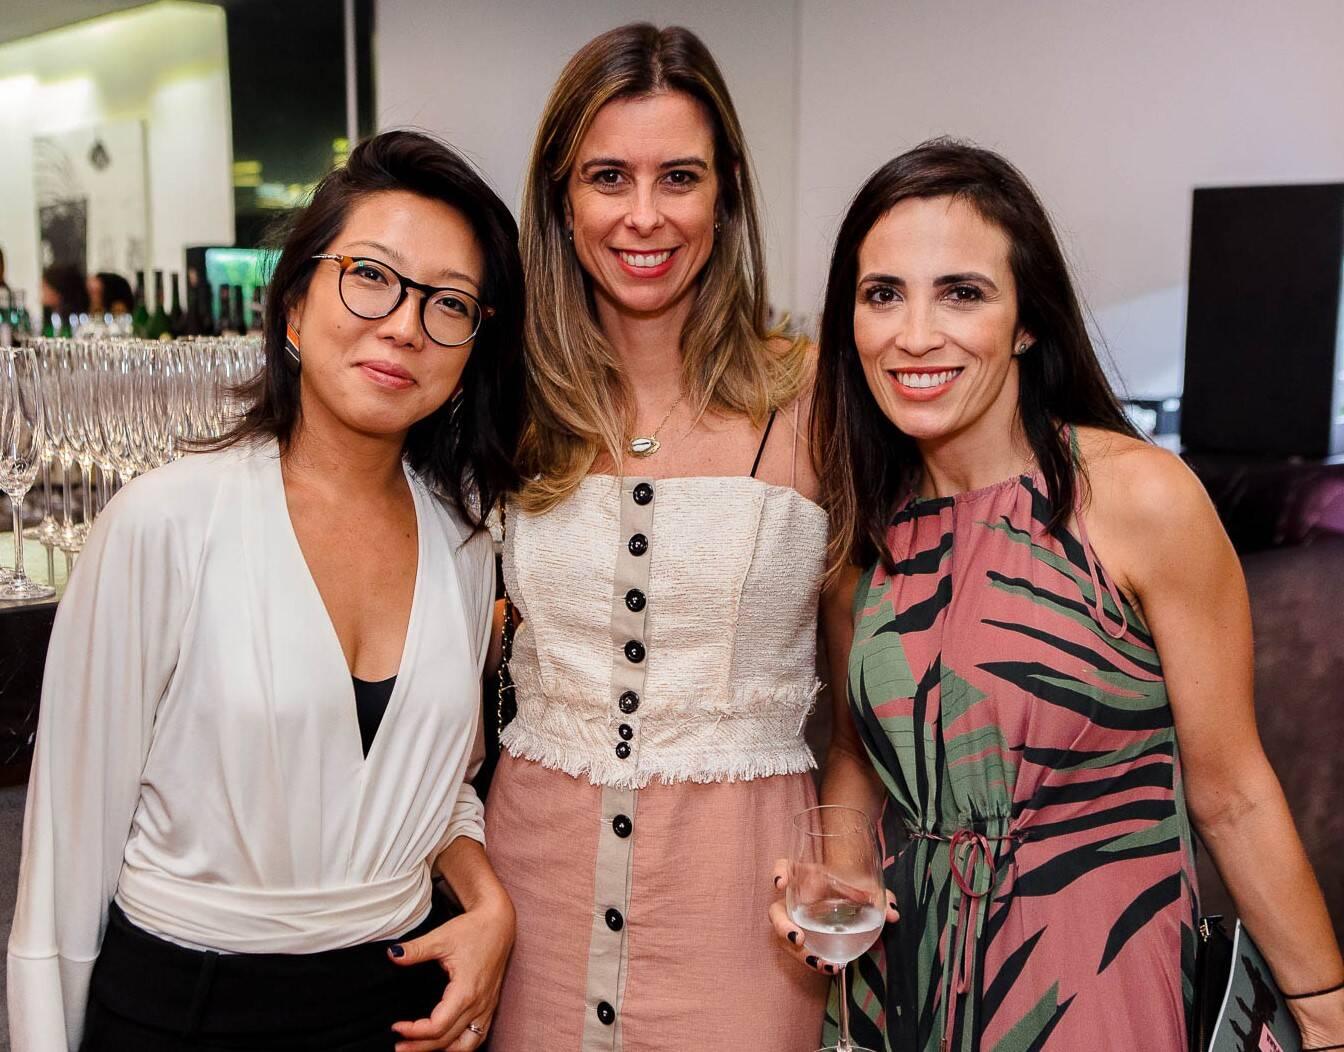 Gisele Sakamoto, Veronica Gordilho e Viviane Farinelli  /Foto: Bruno Ryfer